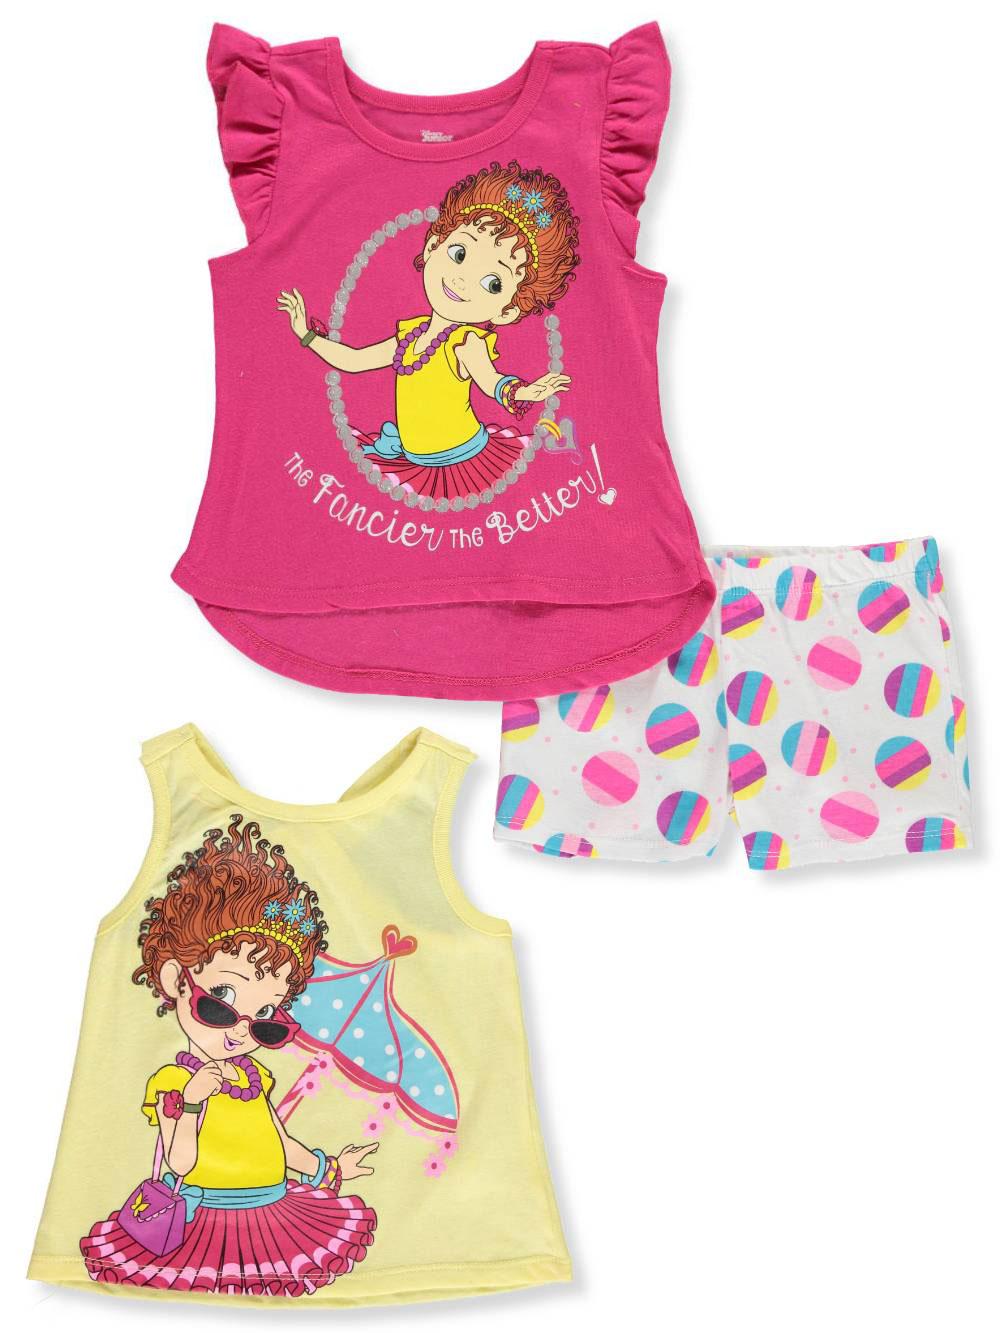 b04c1b627b Disney Fancy Nancy Girls' 3-Piece Shorts Set Outfit